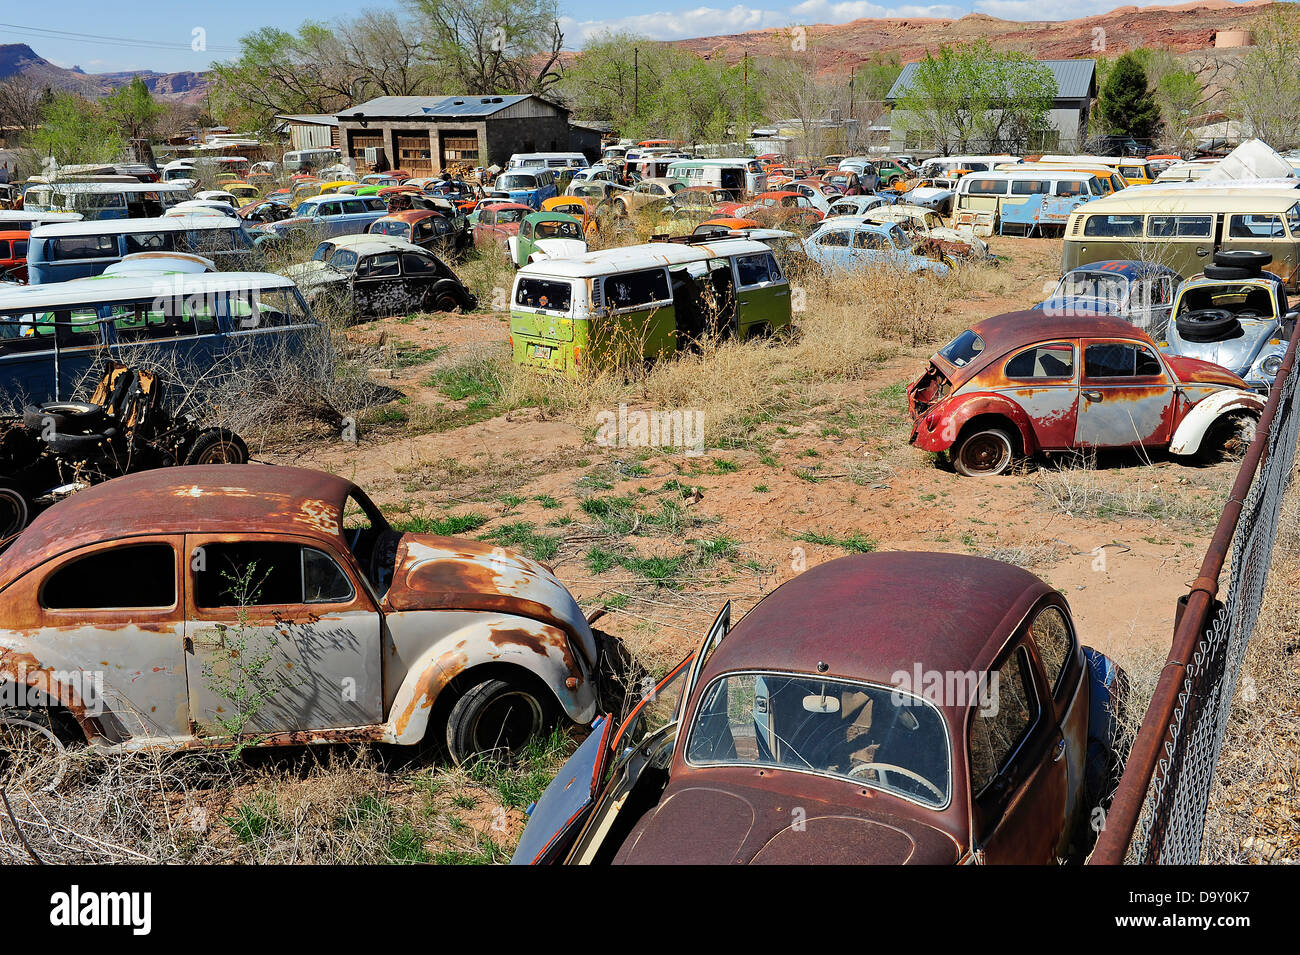 Scrap Yard Full Of Volkswagen Cars And Vans Near Moab